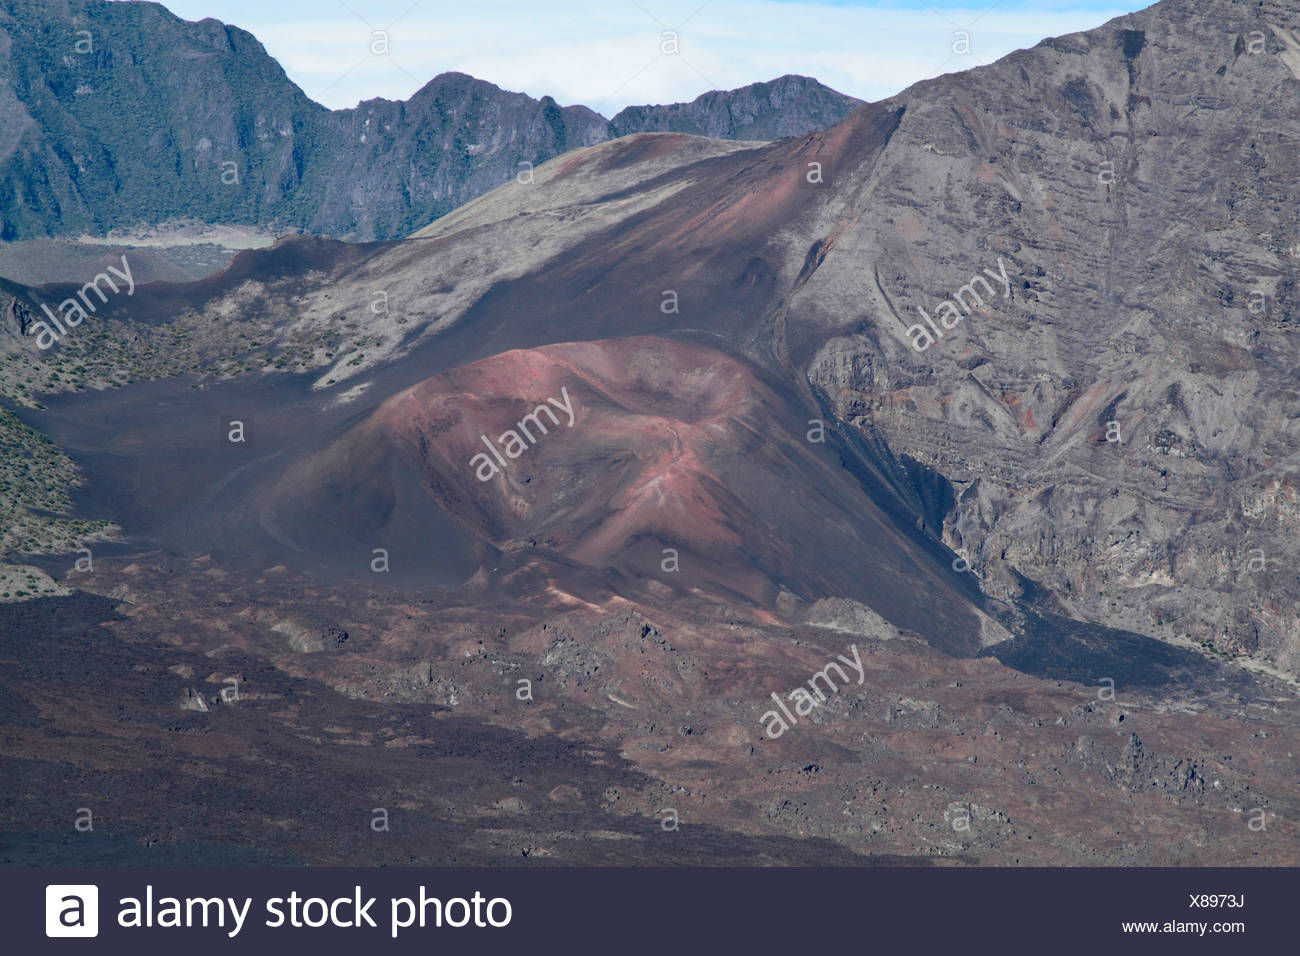 volcanic cone in the crater of Haleakala, USA, Hawaii, Maui - Stock Image